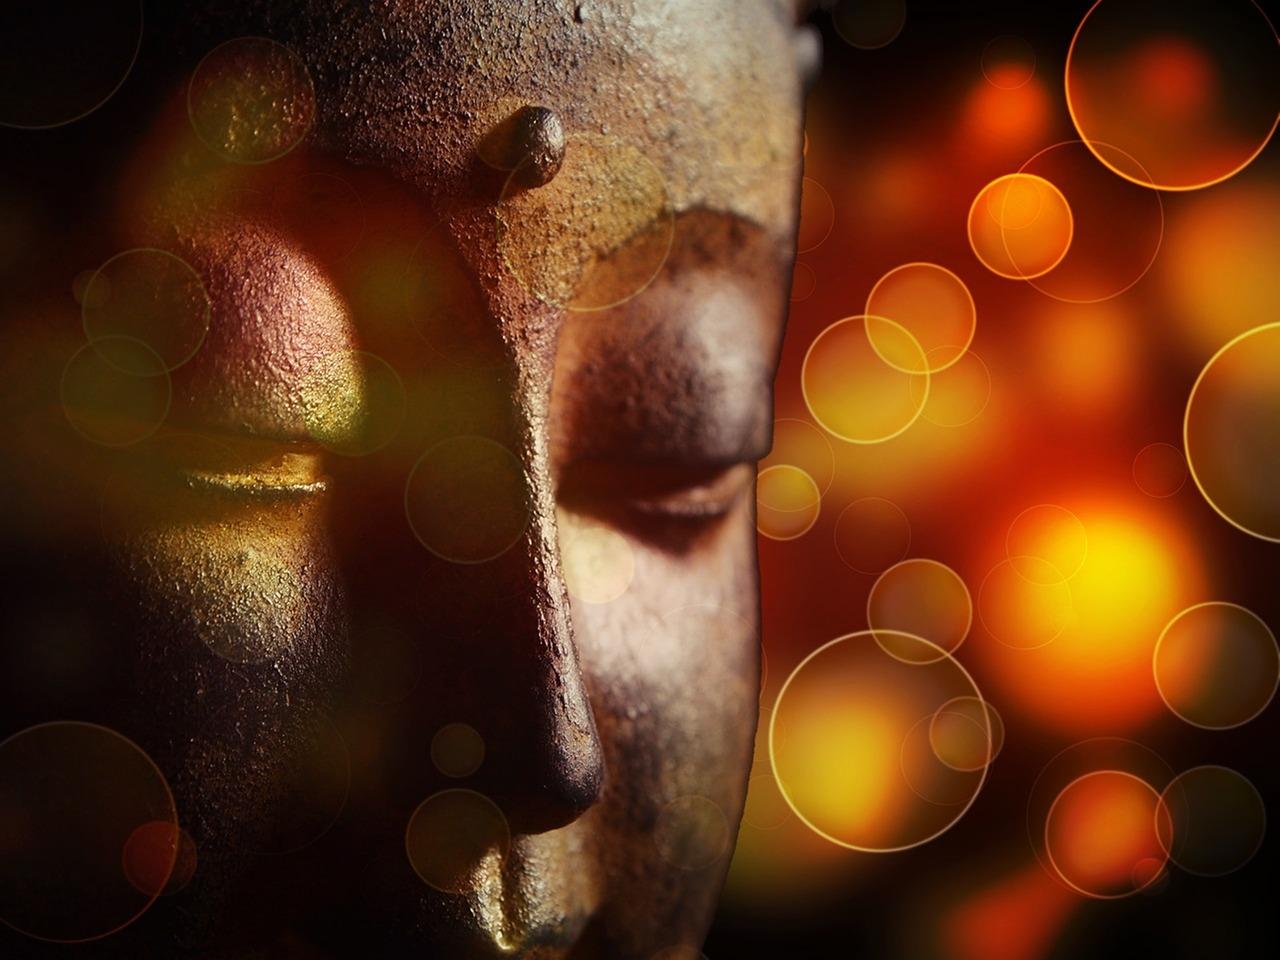 buddha-1915589_1280.jpg